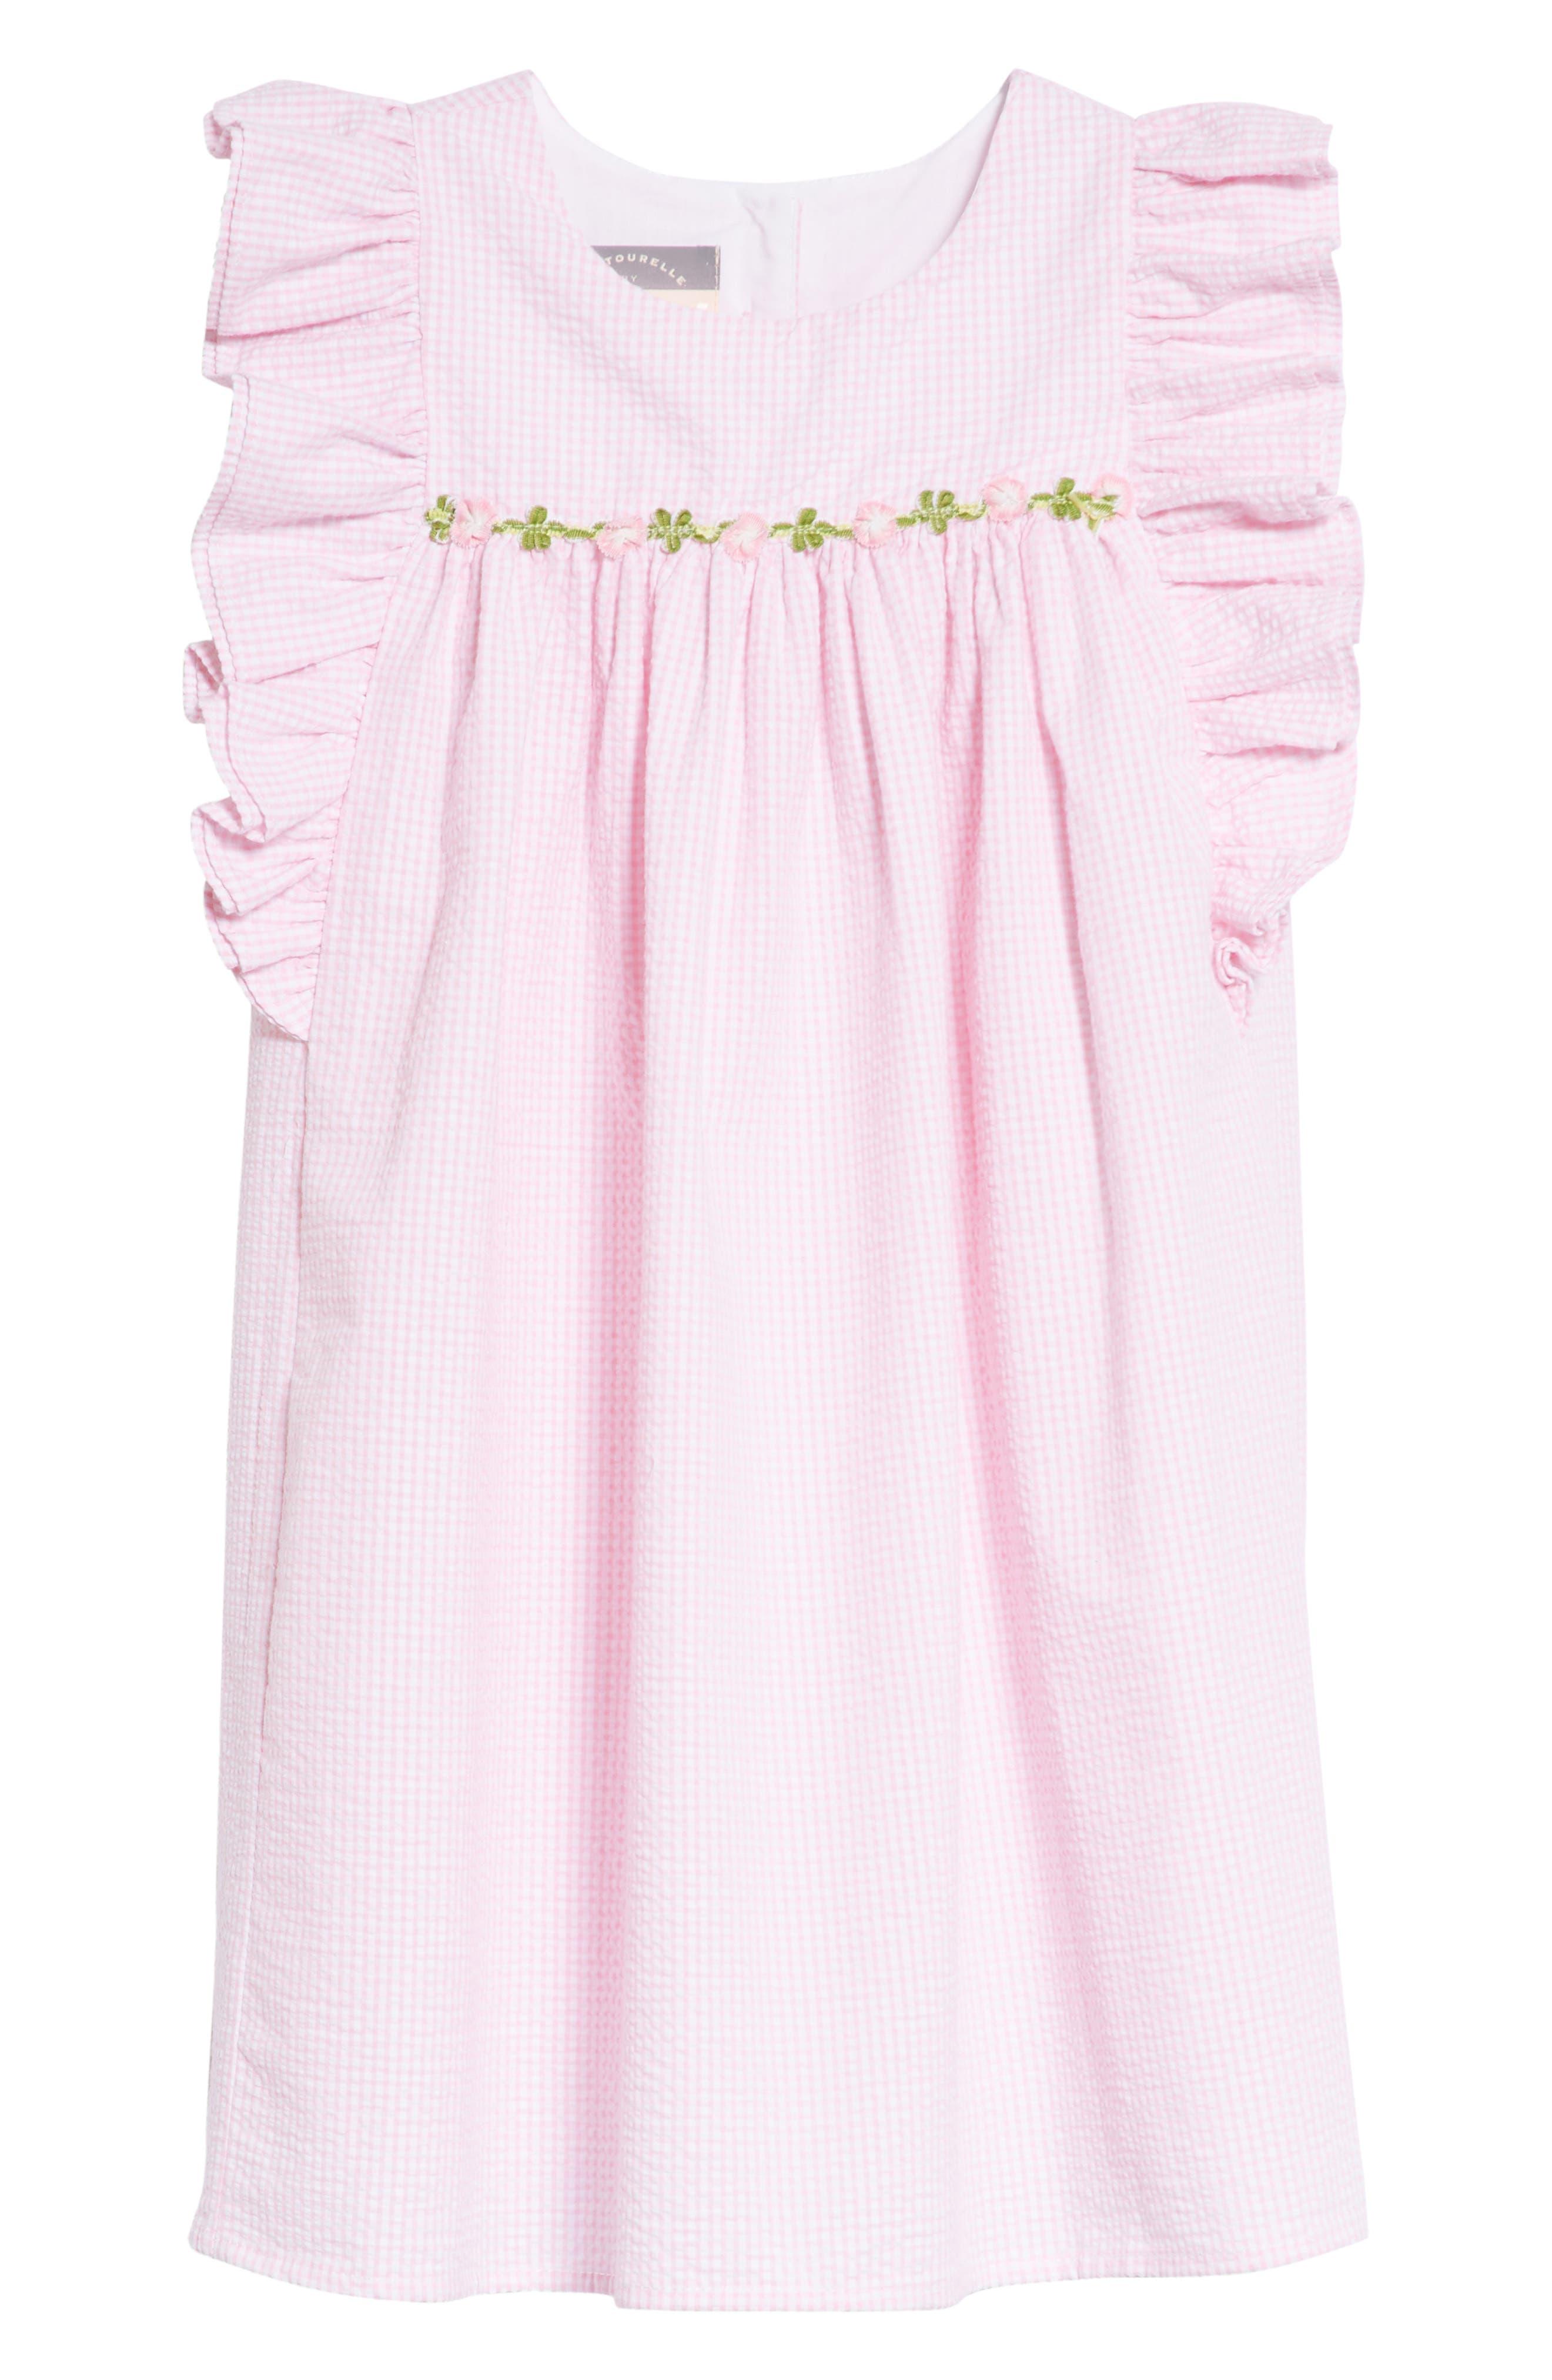 Seersucker Ruffle Sleeve Dress,                             Main thumbnail 1, color,                             Pink/ White